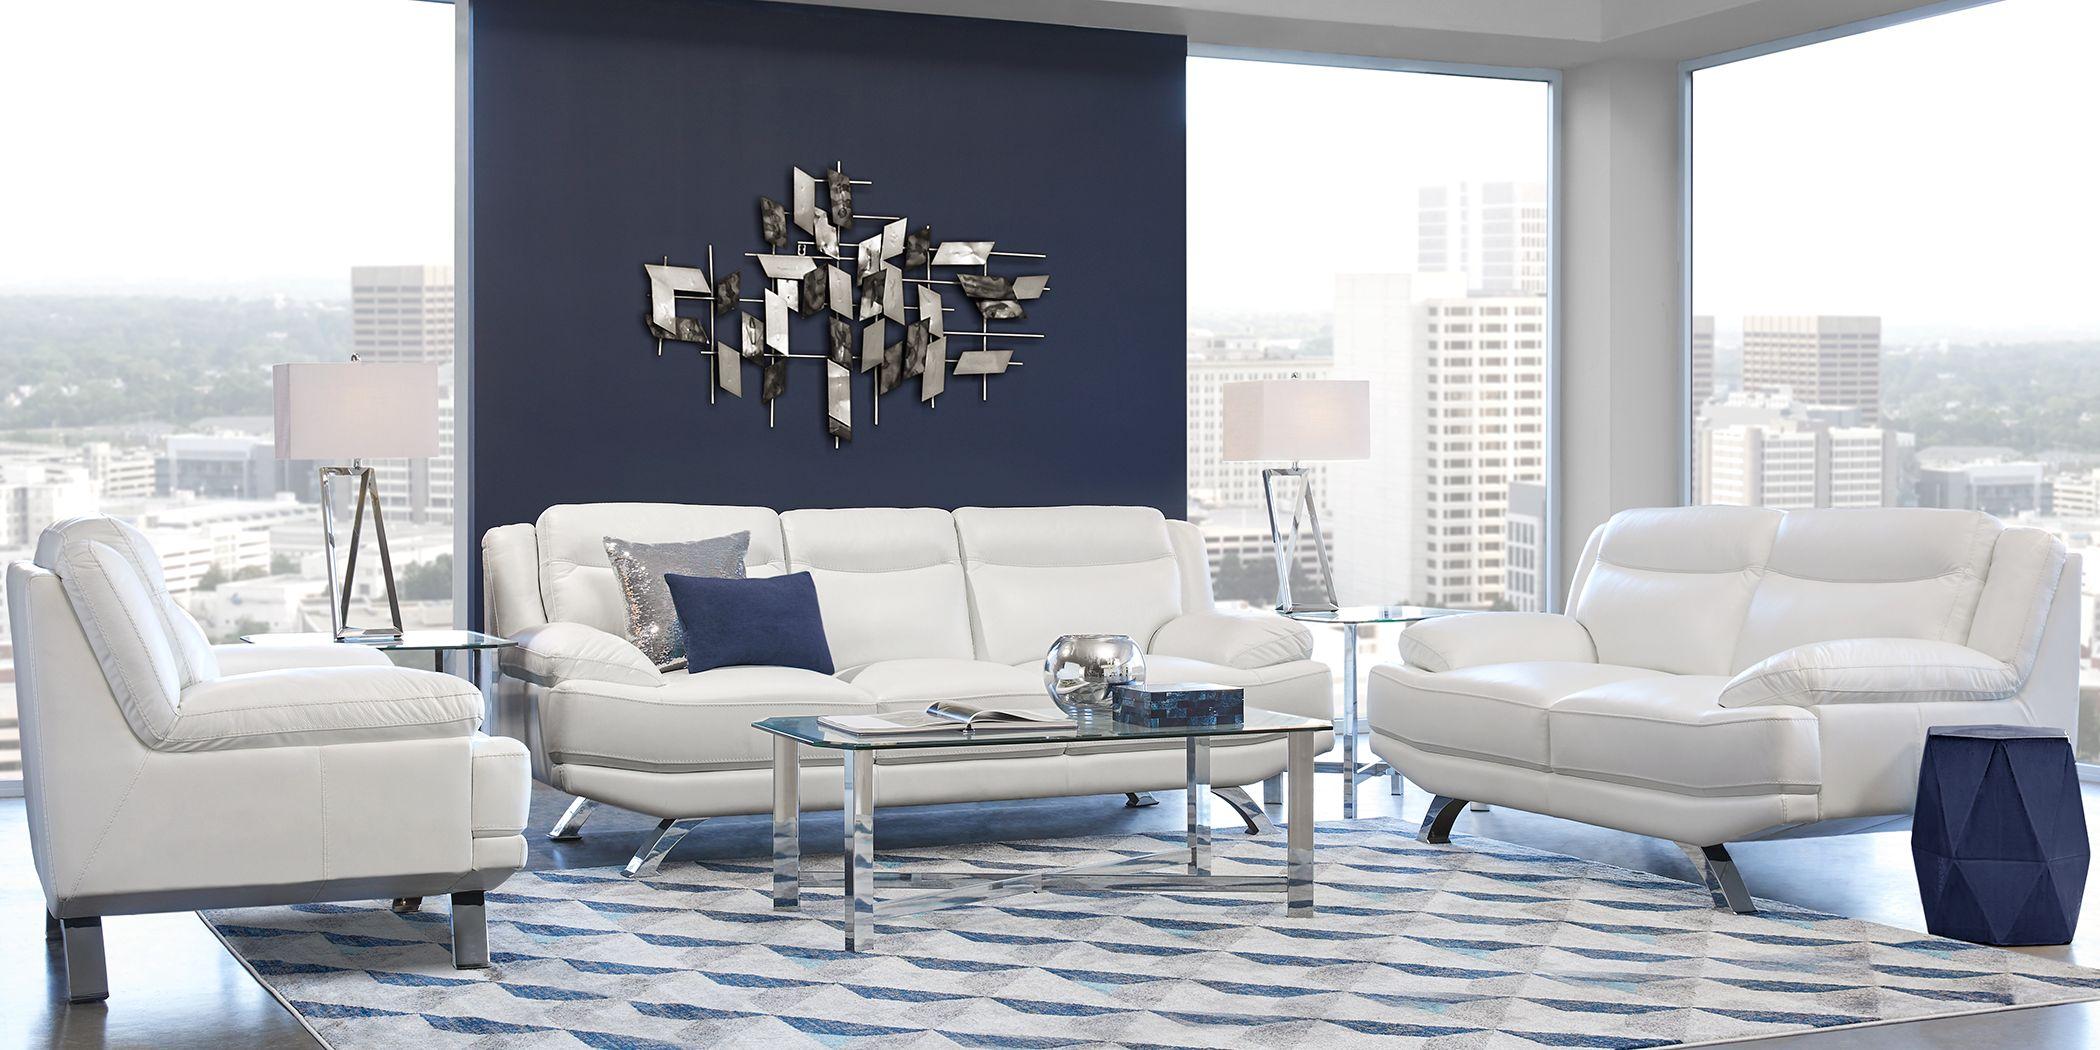 Sofia Vergara Zamora White Leather 3 Pc Living Room